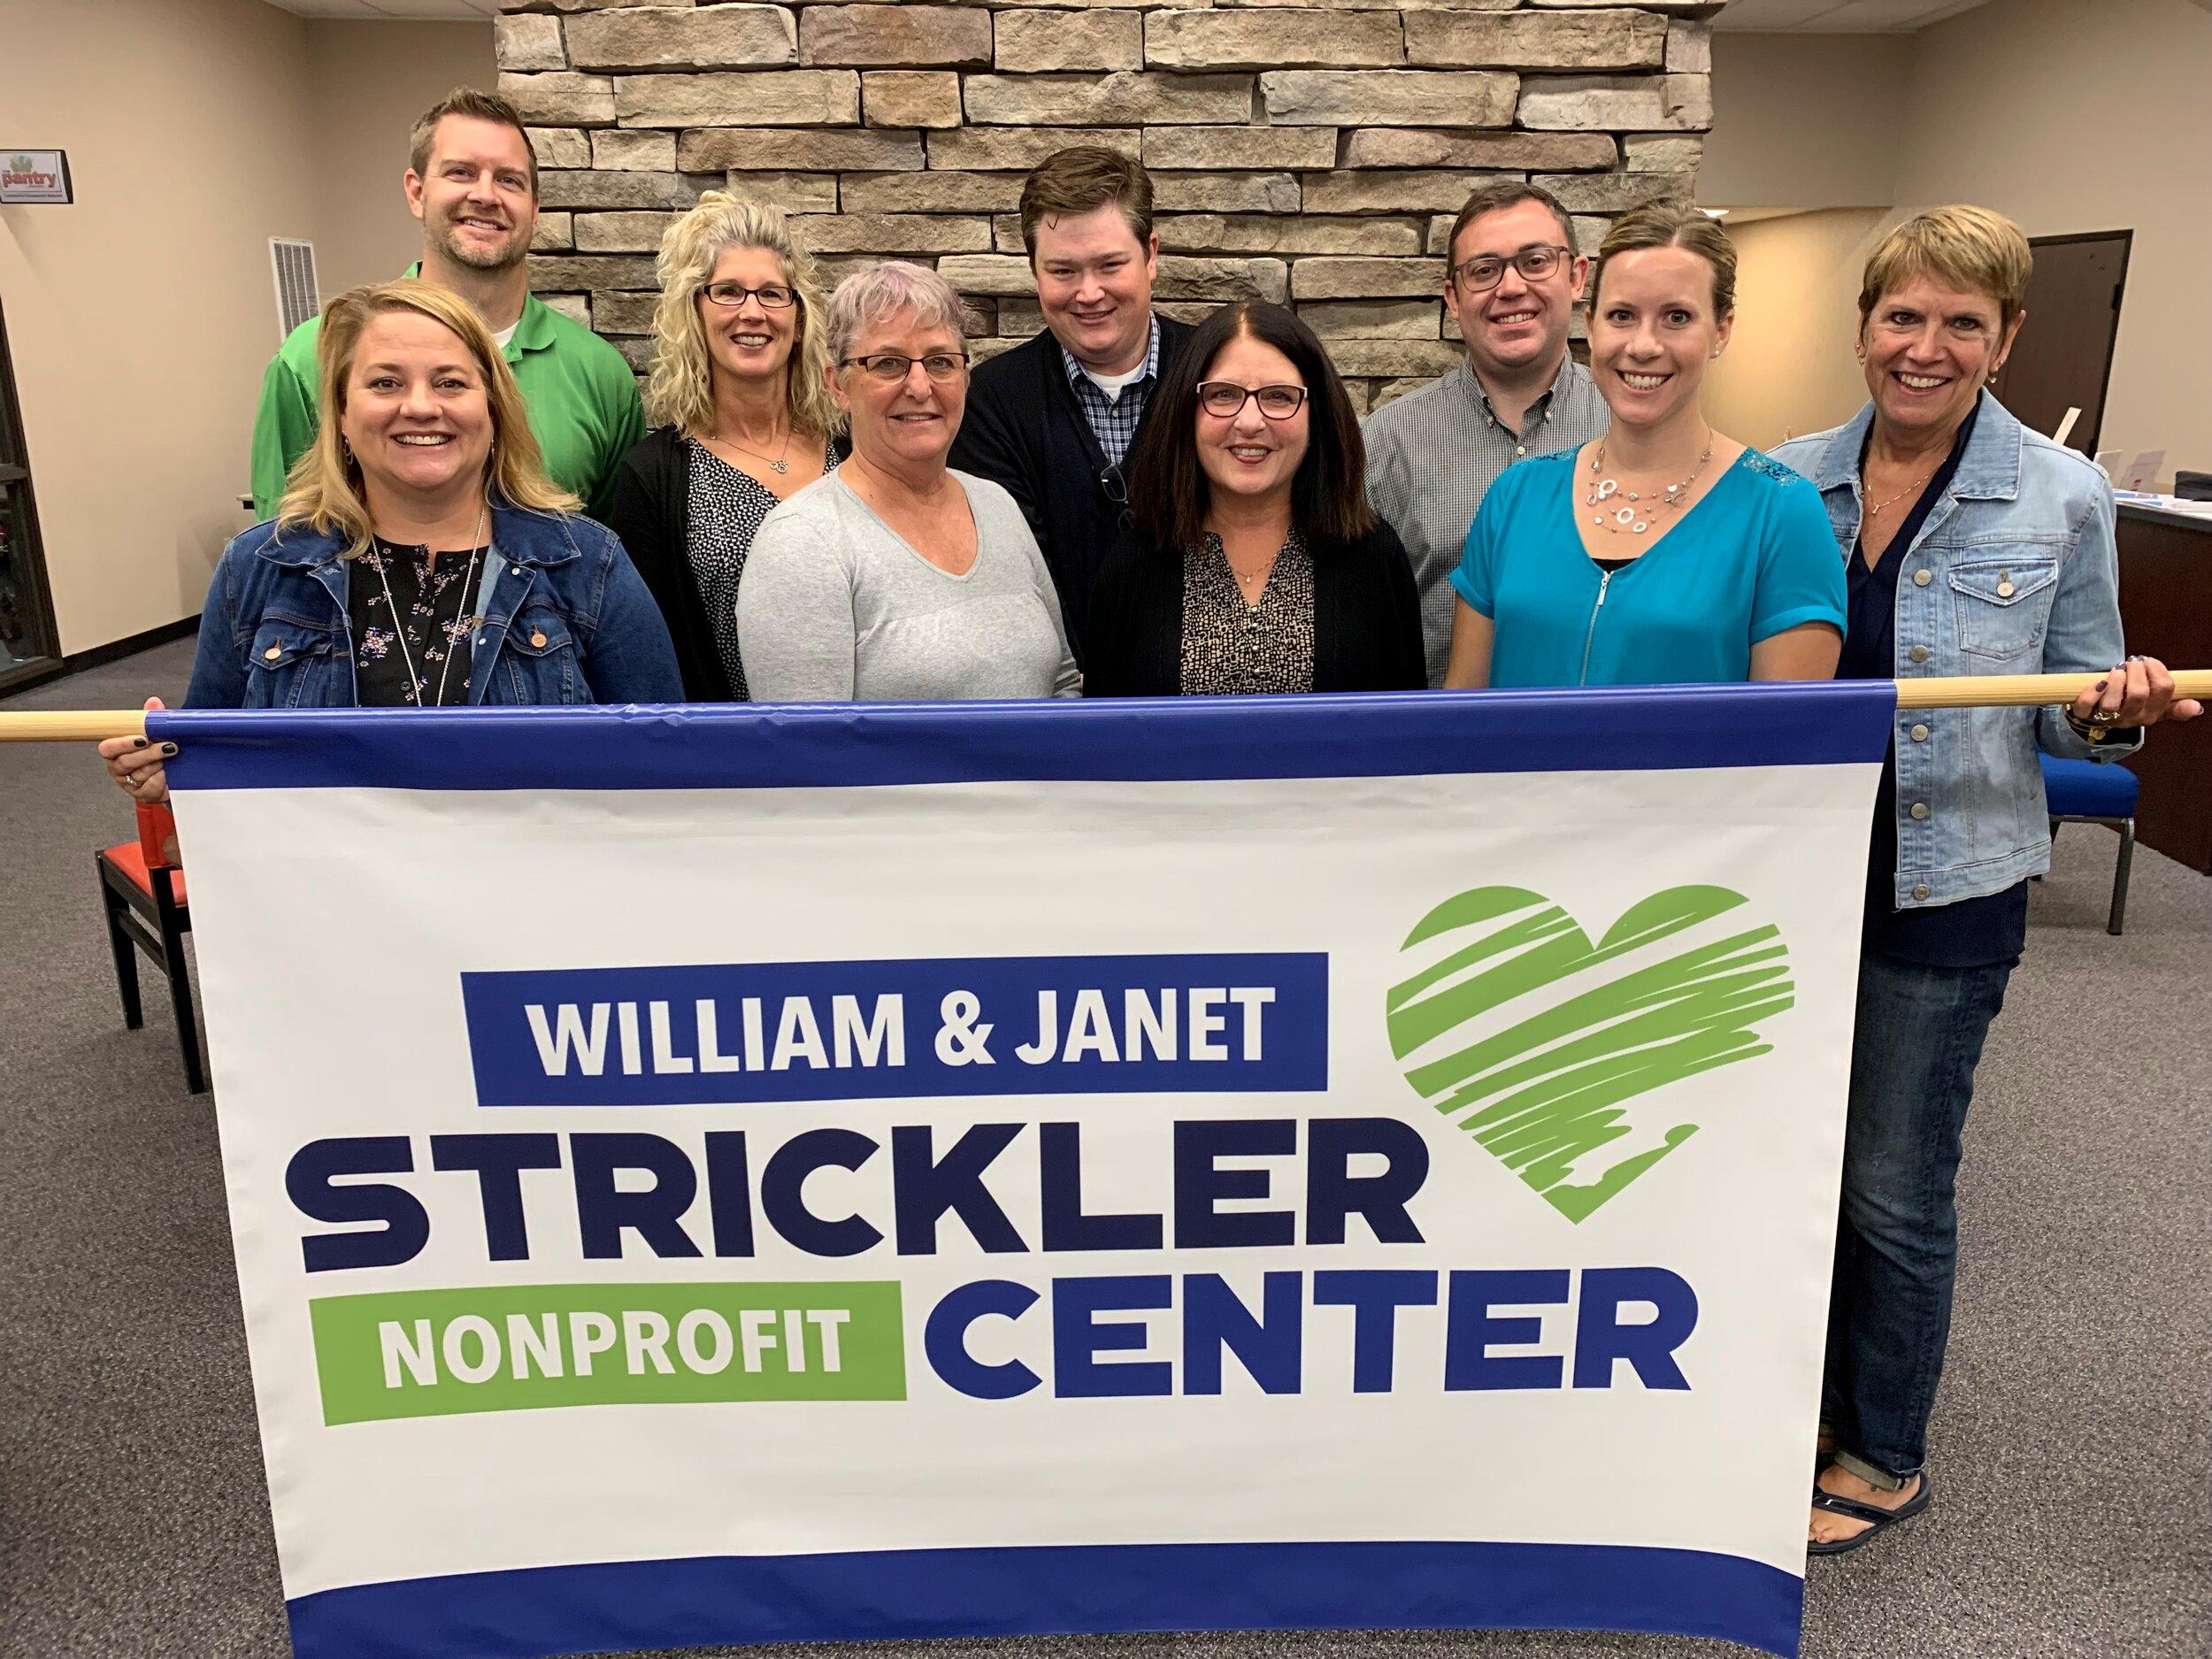 Strickler Center Board 9-18-19.jpg